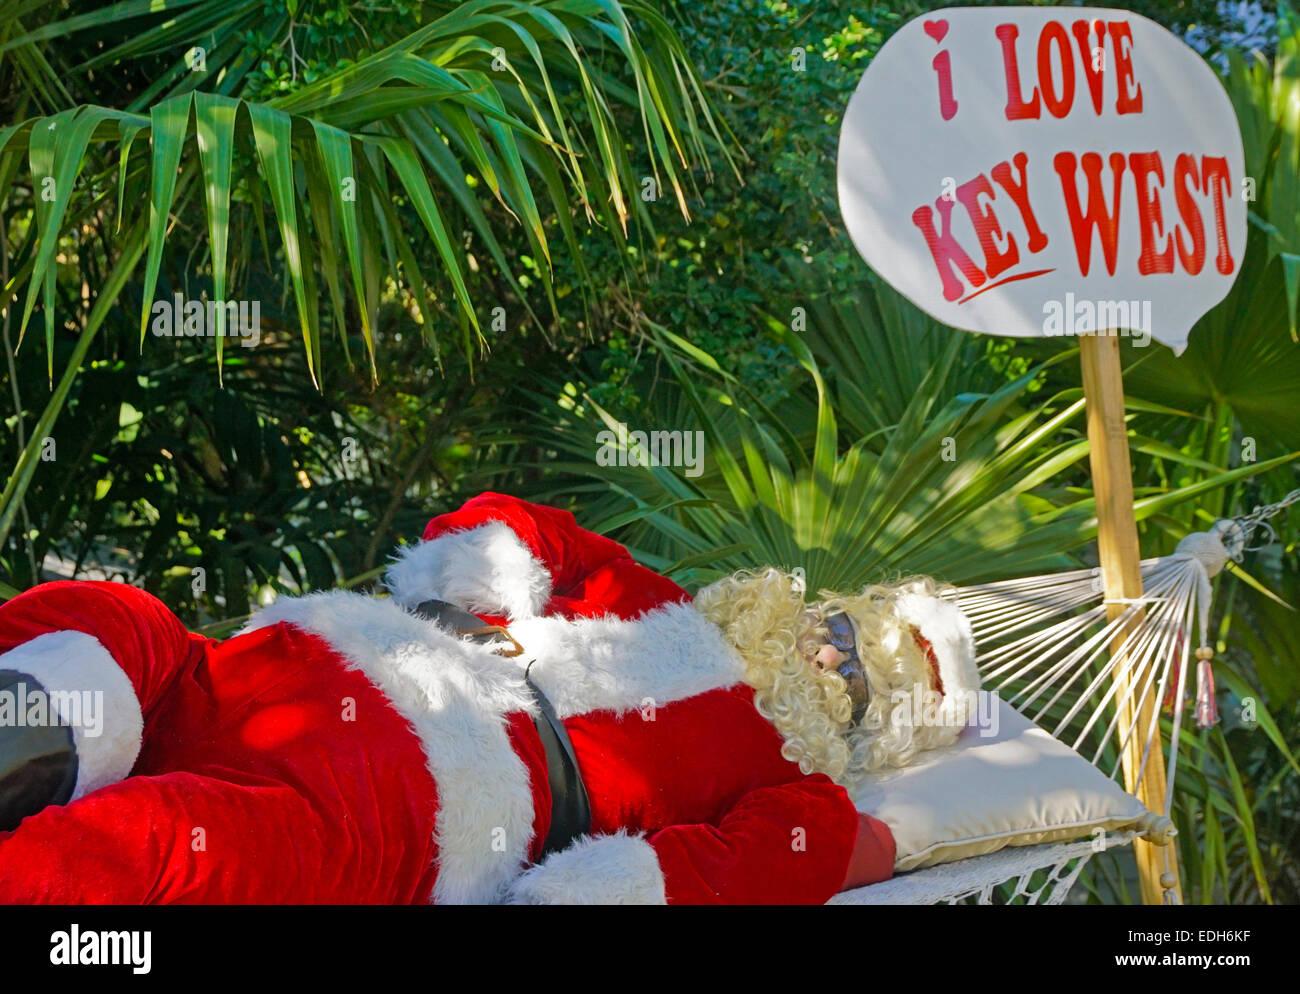 Christmas In The Keys Stock Photos & Christmas In The Keys Stock ...